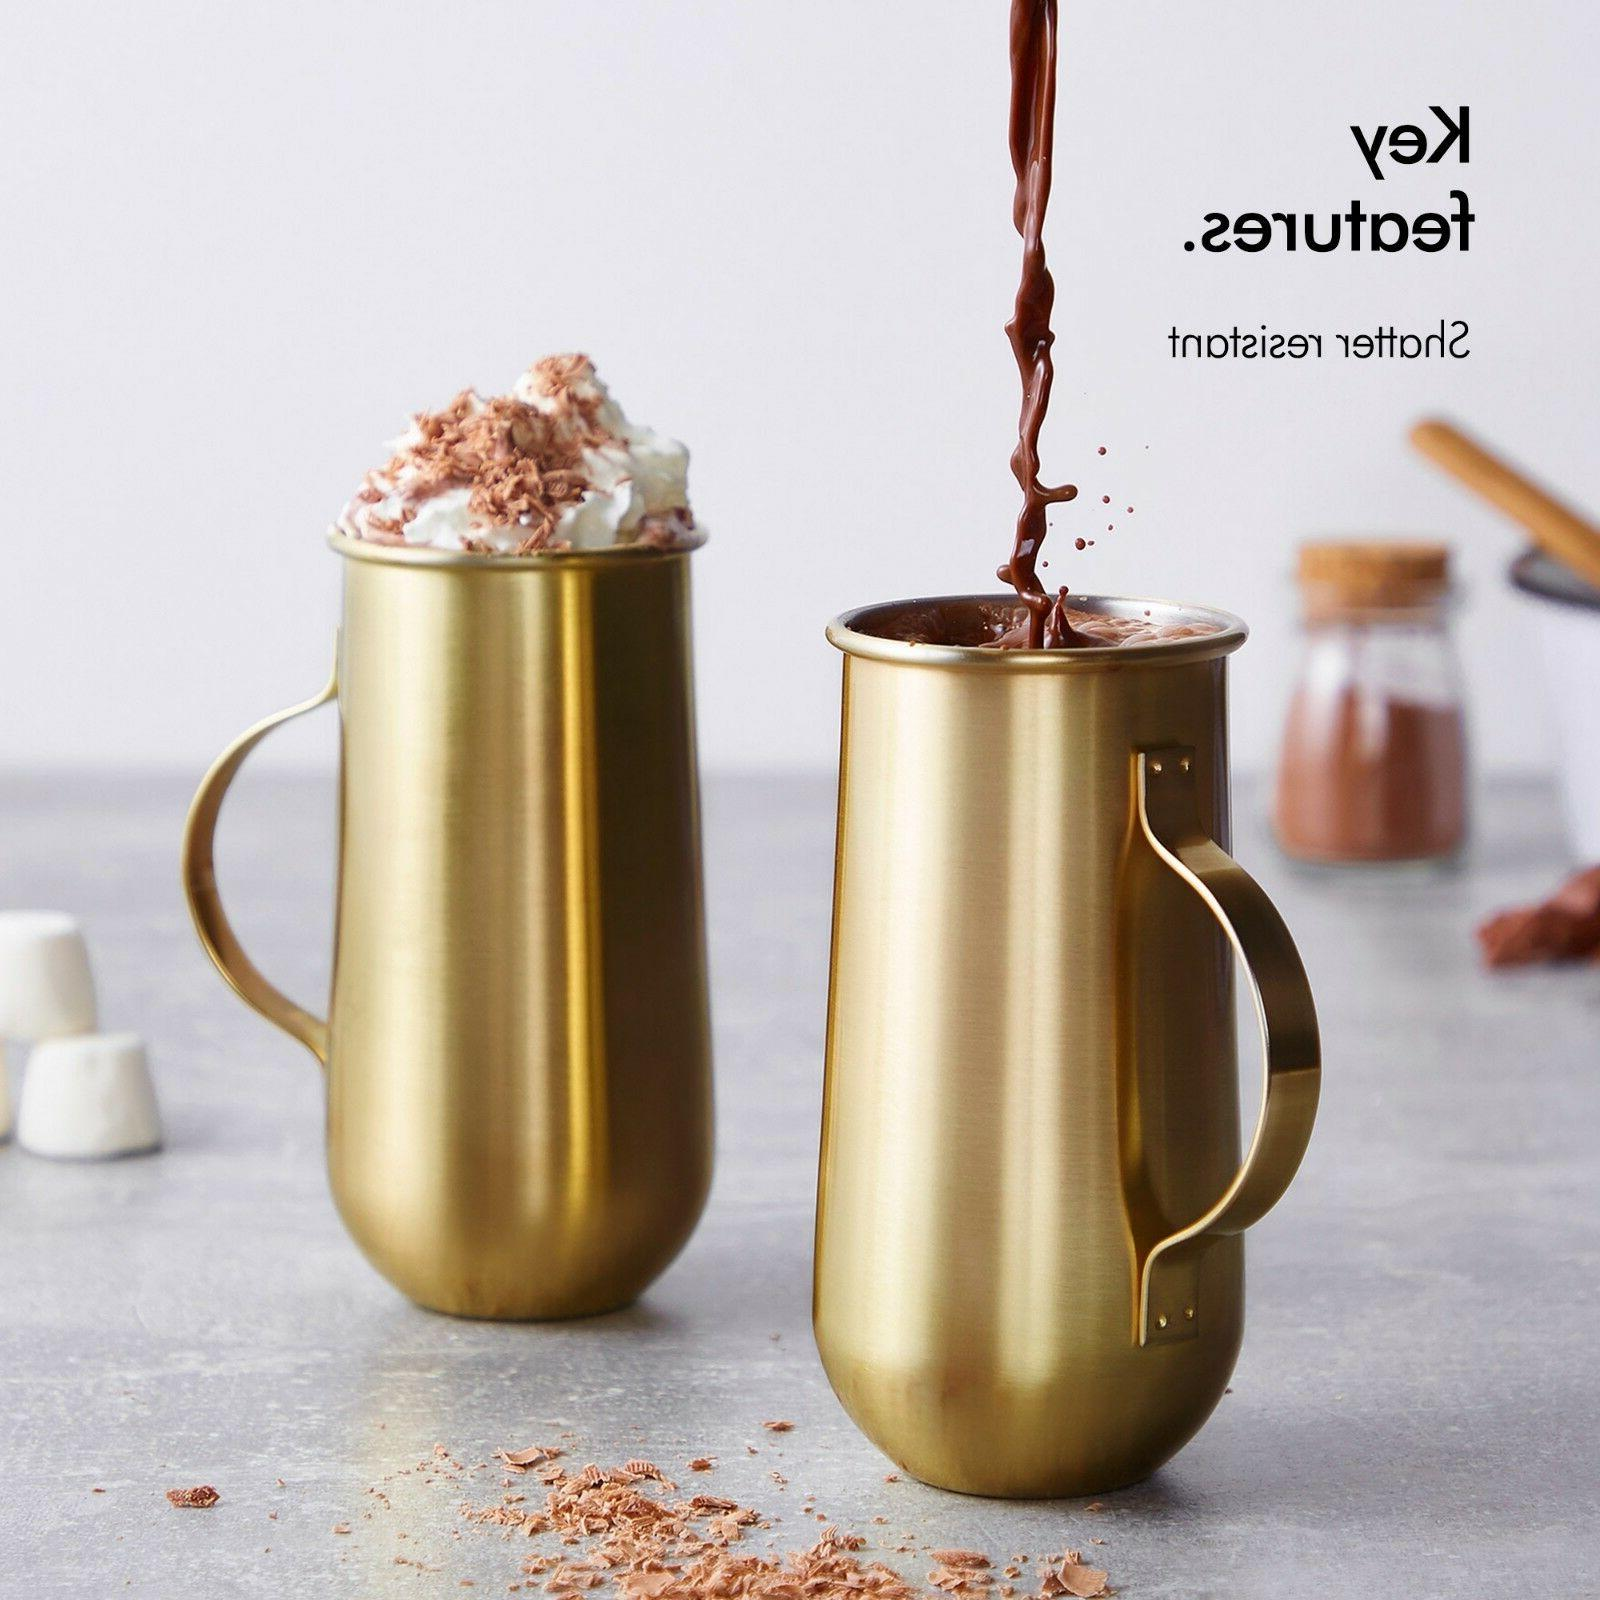 VonShef Gold Mugs - 16oz - Gift Boxed